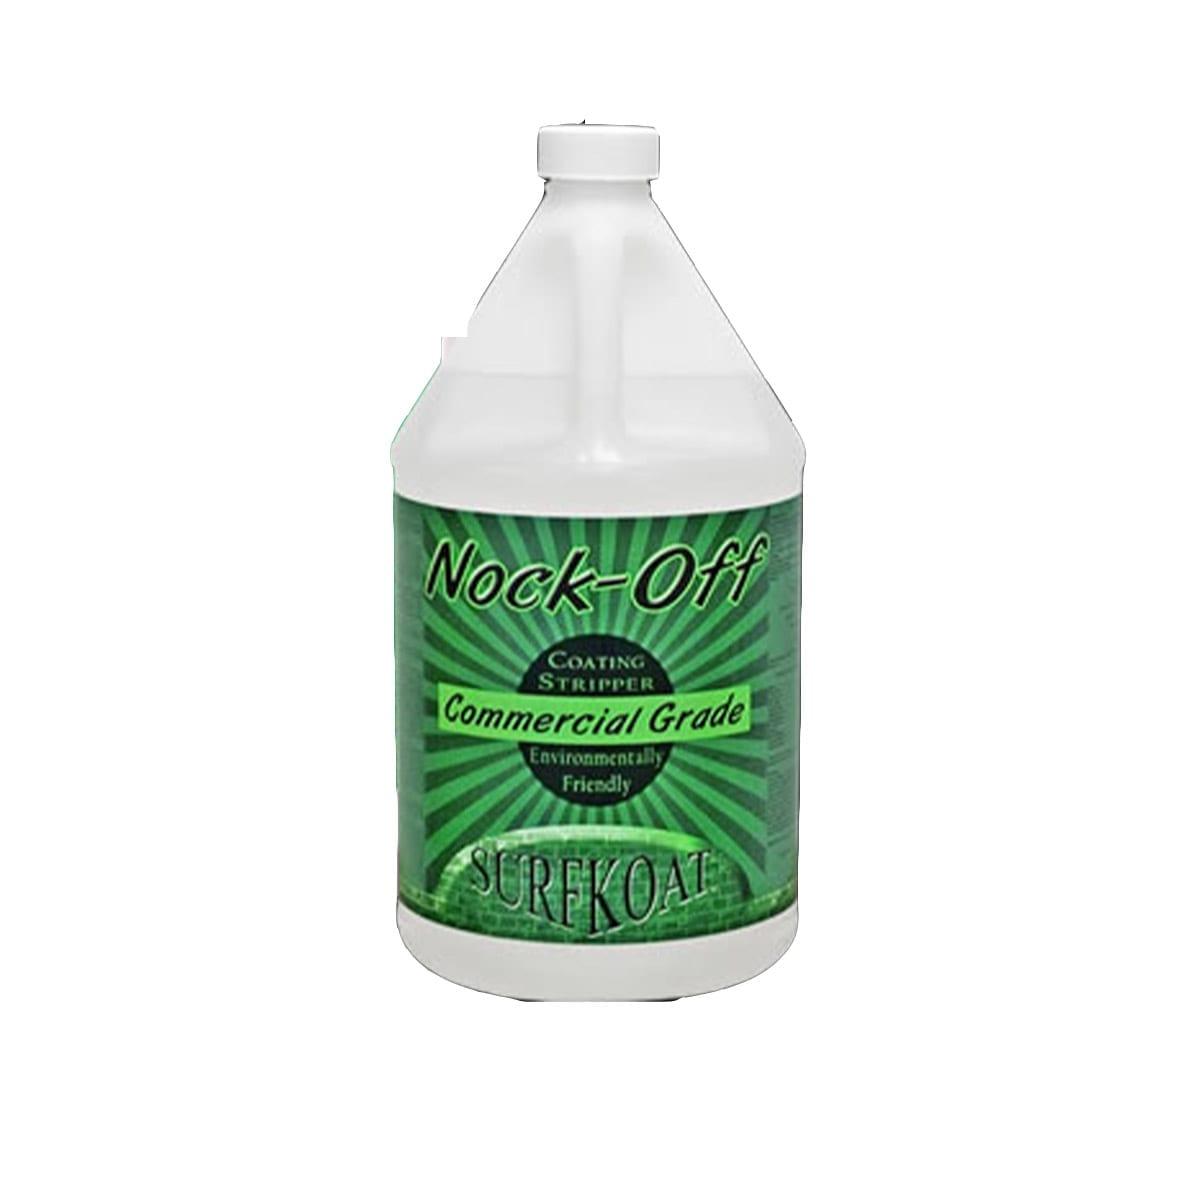 1 Gallon SurfKoat Nock-Off Biodegradable Commercial Coatings Stripper - North Carolina and South Carolina